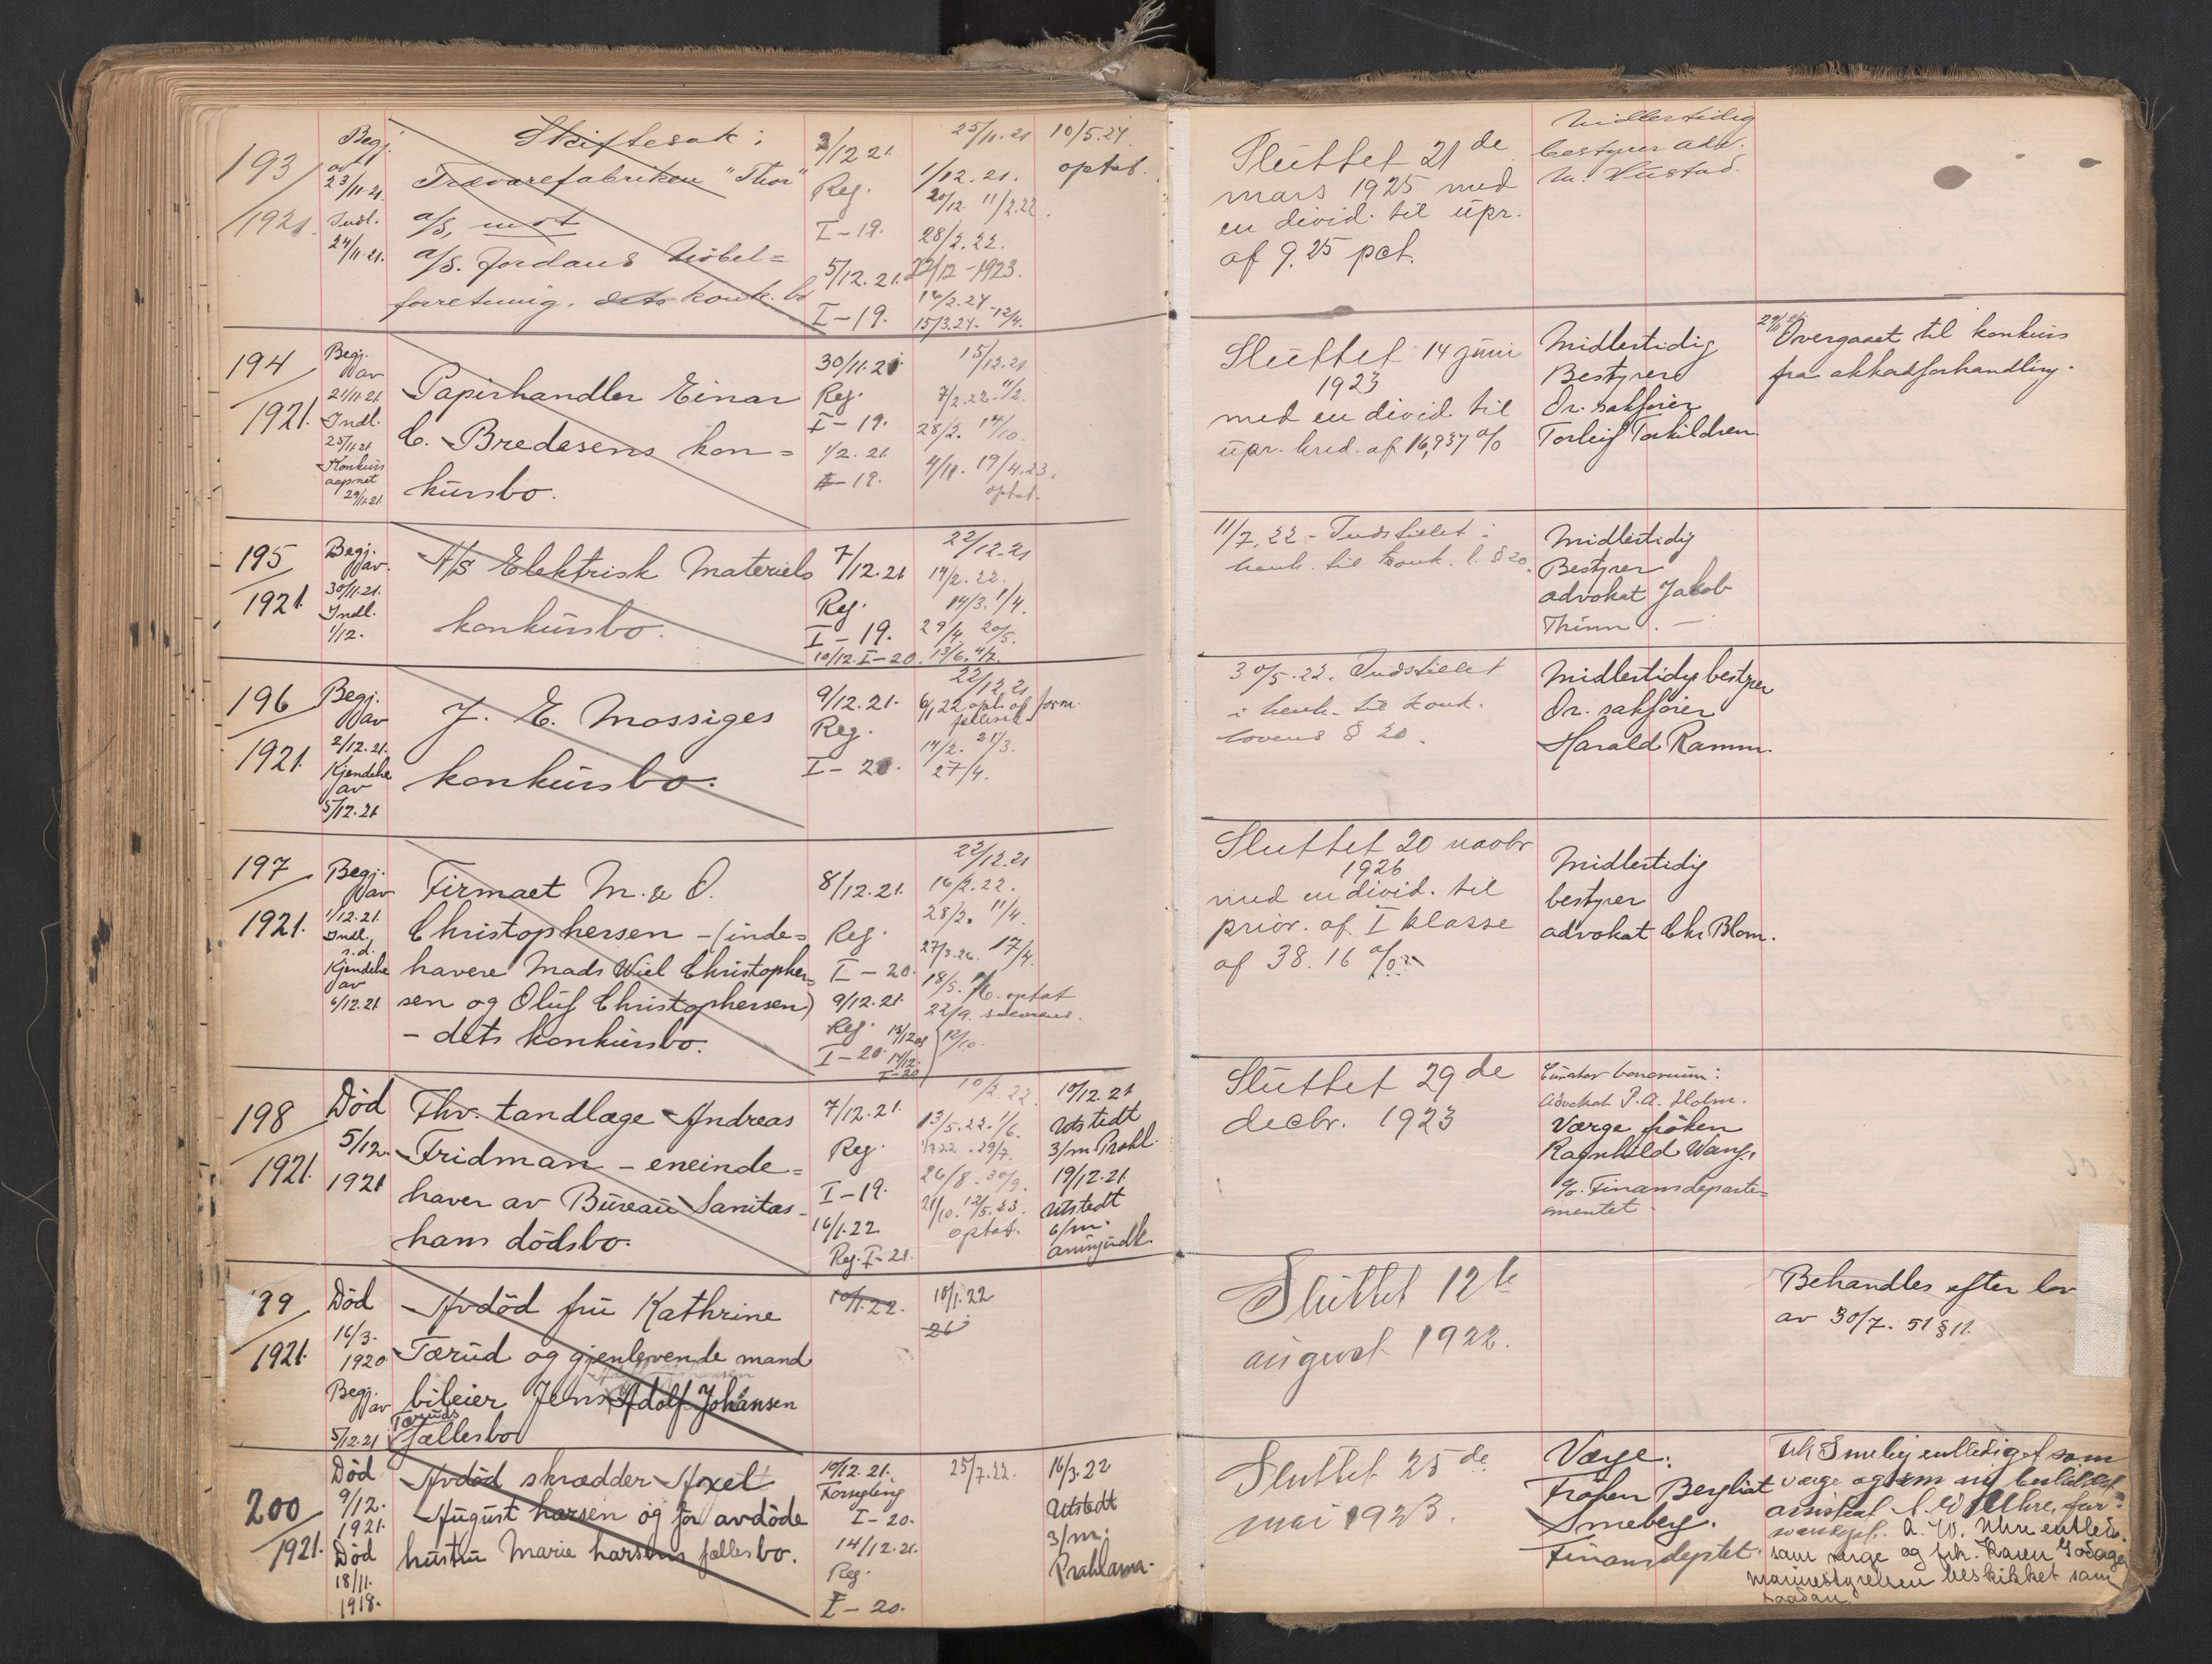 SAO, Oslo skifterett, F/Fb/Fbb/Fbbb/L0001: Skifteliste for sluttede bo - avd. I, 1909-1921